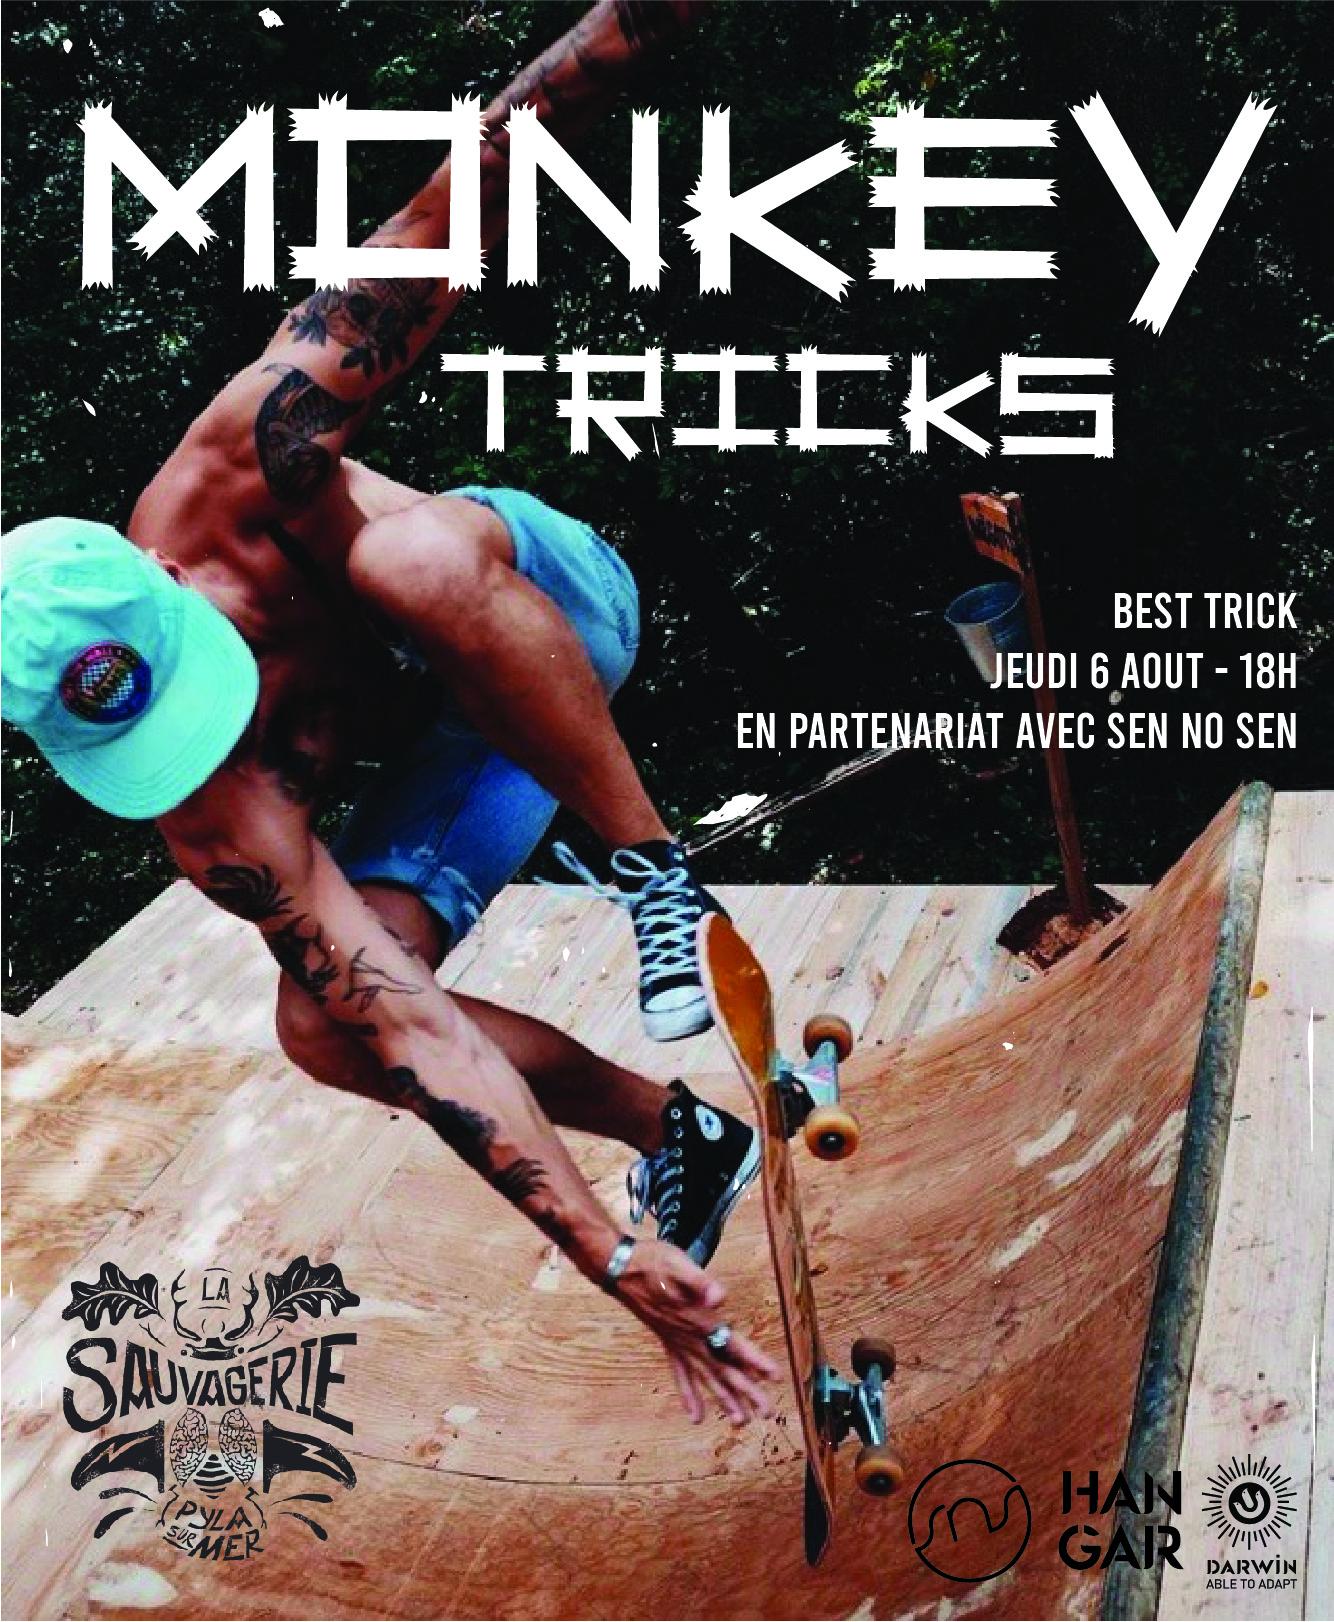 Monkey Tricks contest